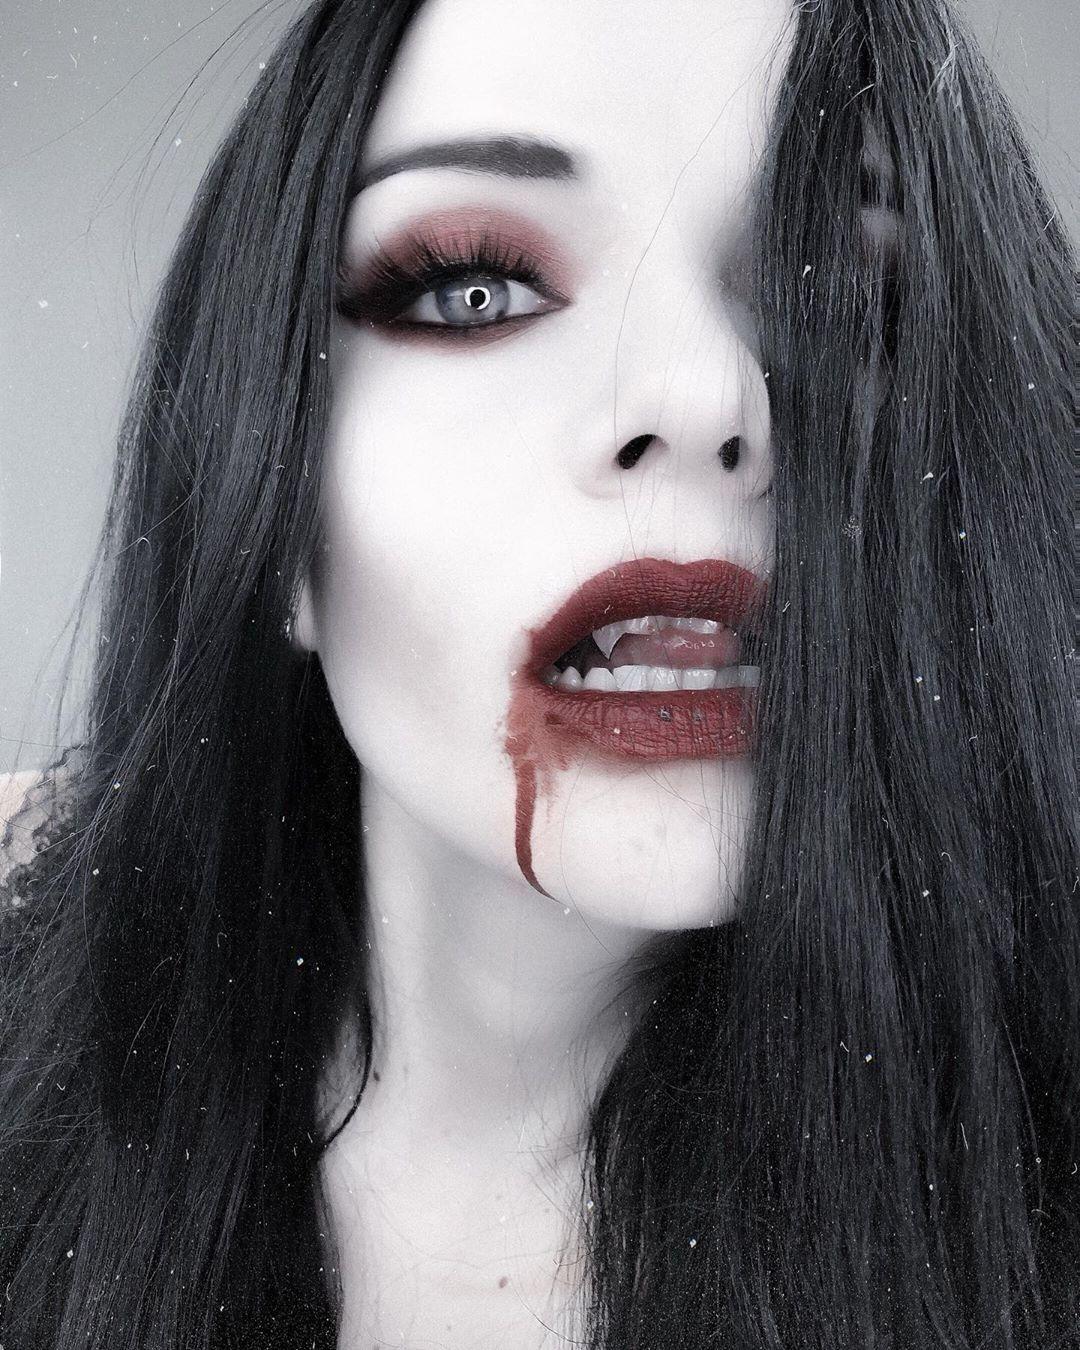 Pin by Elde on eLDe in 2020 Hot vampires, Halloween face